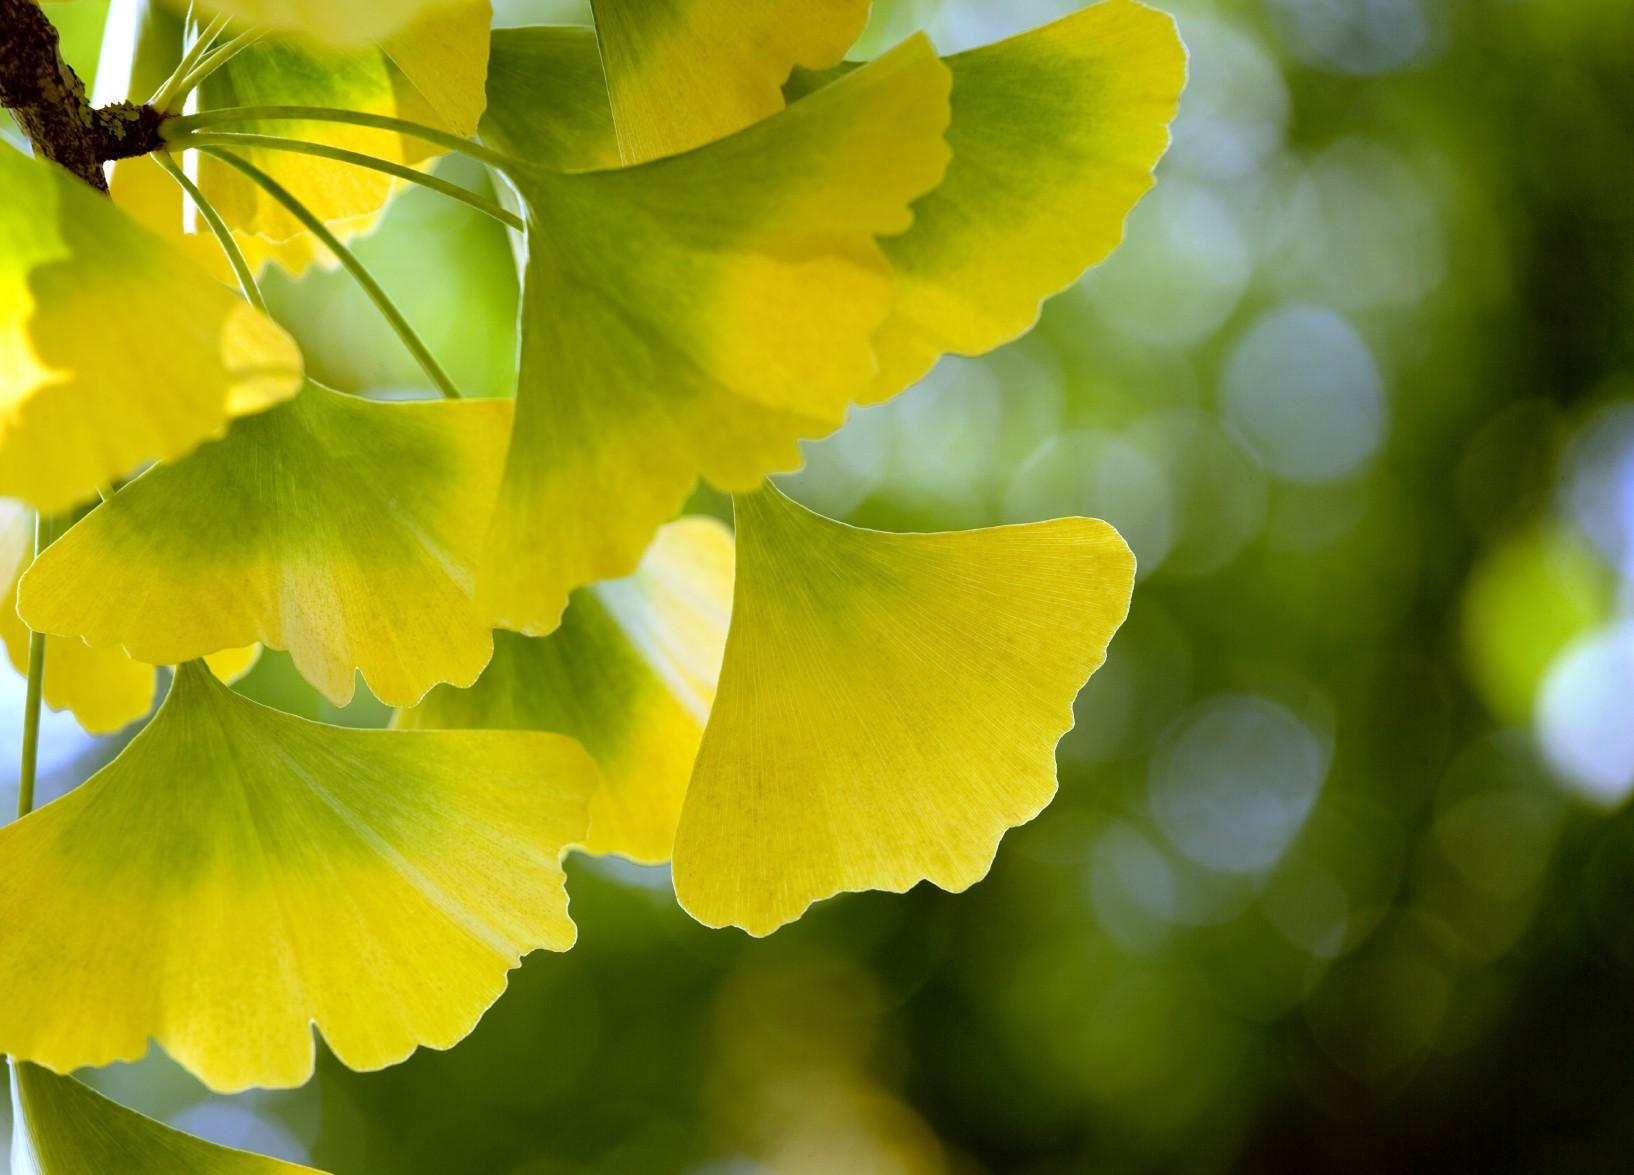 Httpbalanceaustinleswordpress201103green yellow httpbalanceaustinleswordpress201103green yellow flowersg japanese tattoo pinterest yellow flowers green flowers and flower images mightylinksfo